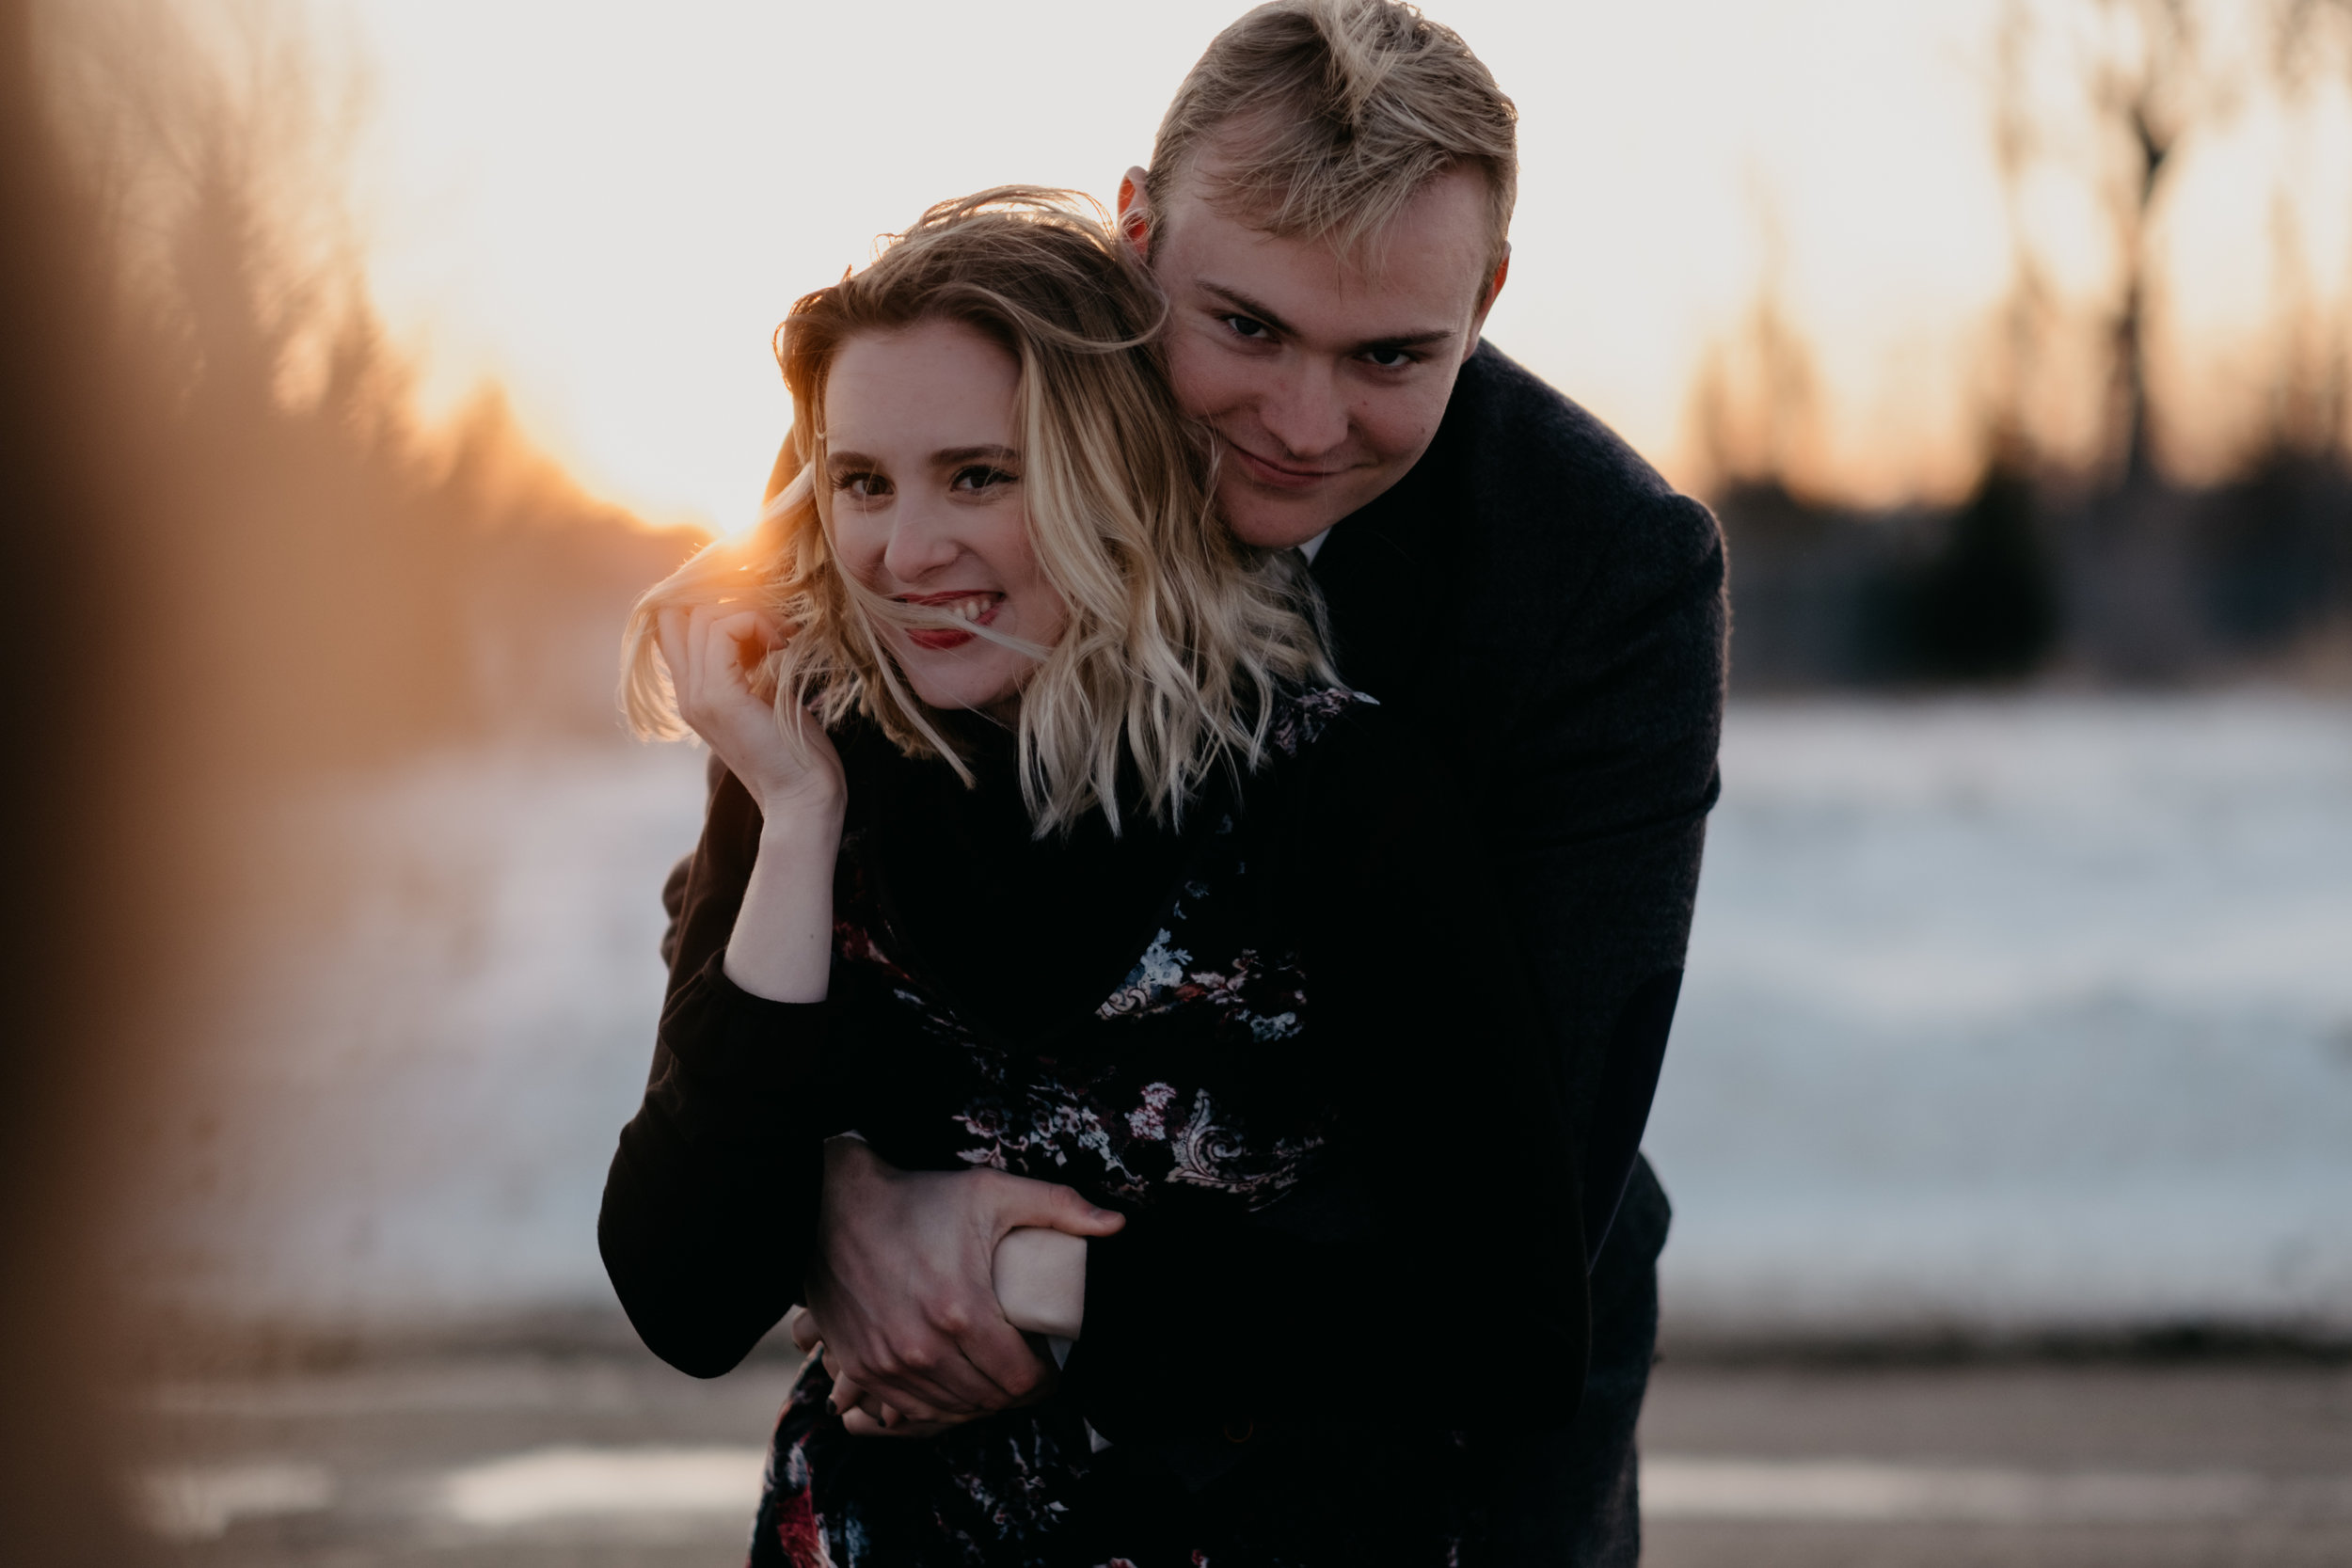 Talia + Brendan | Engagement Photography | Sioux Falls, South Dakota Photographer-154.jpg